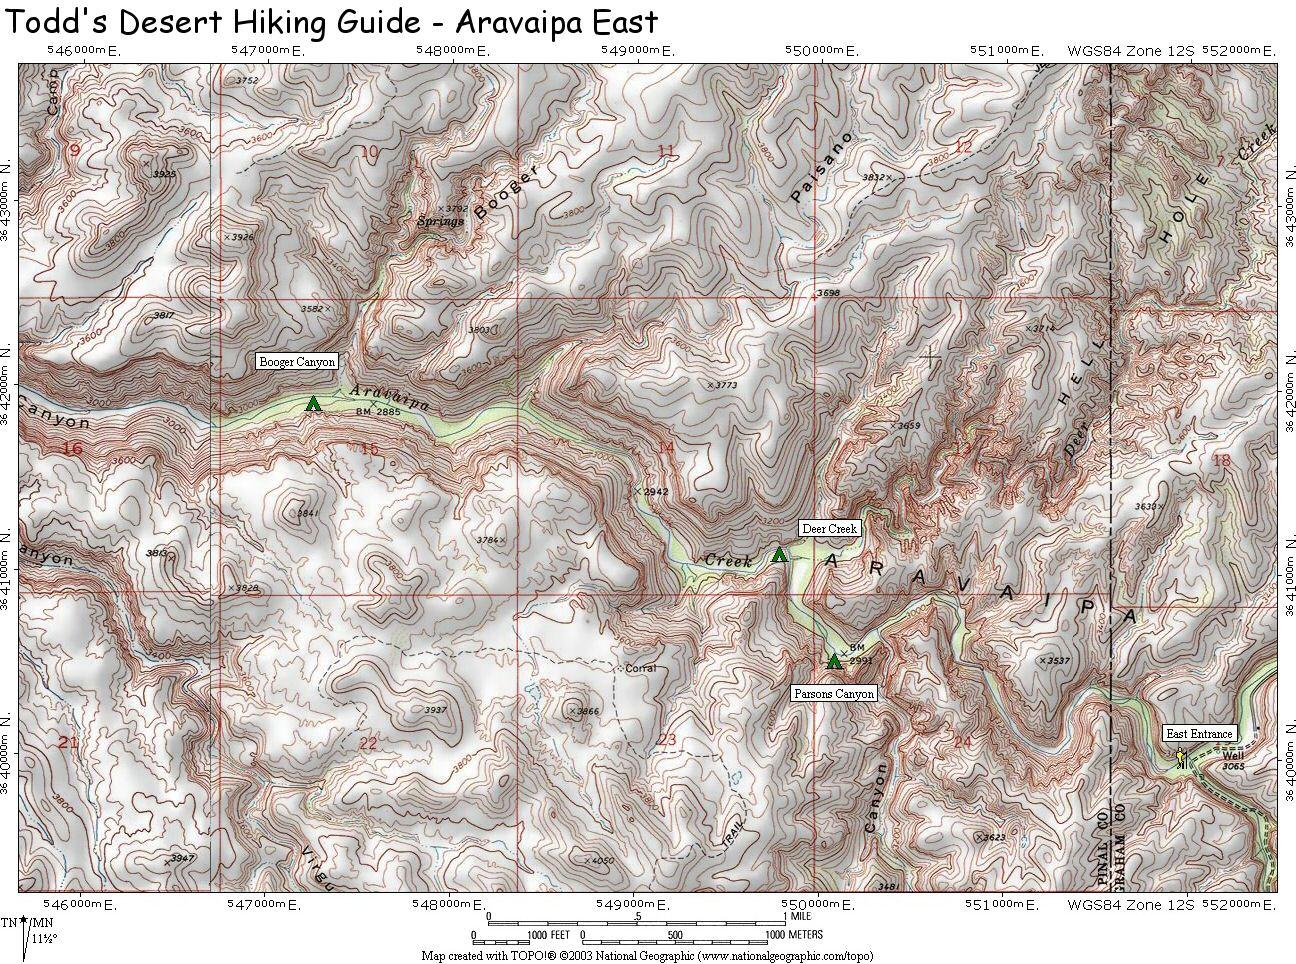 Aravaipa Canyon on canyons park city ski map, park city lift map, sedona arizona hiking trails map, canyons resort village map, canyons ski trail map, the canyons ski resort, the canyons park city, grand canyon hiking map, into the wild trail map, utah canyons map,